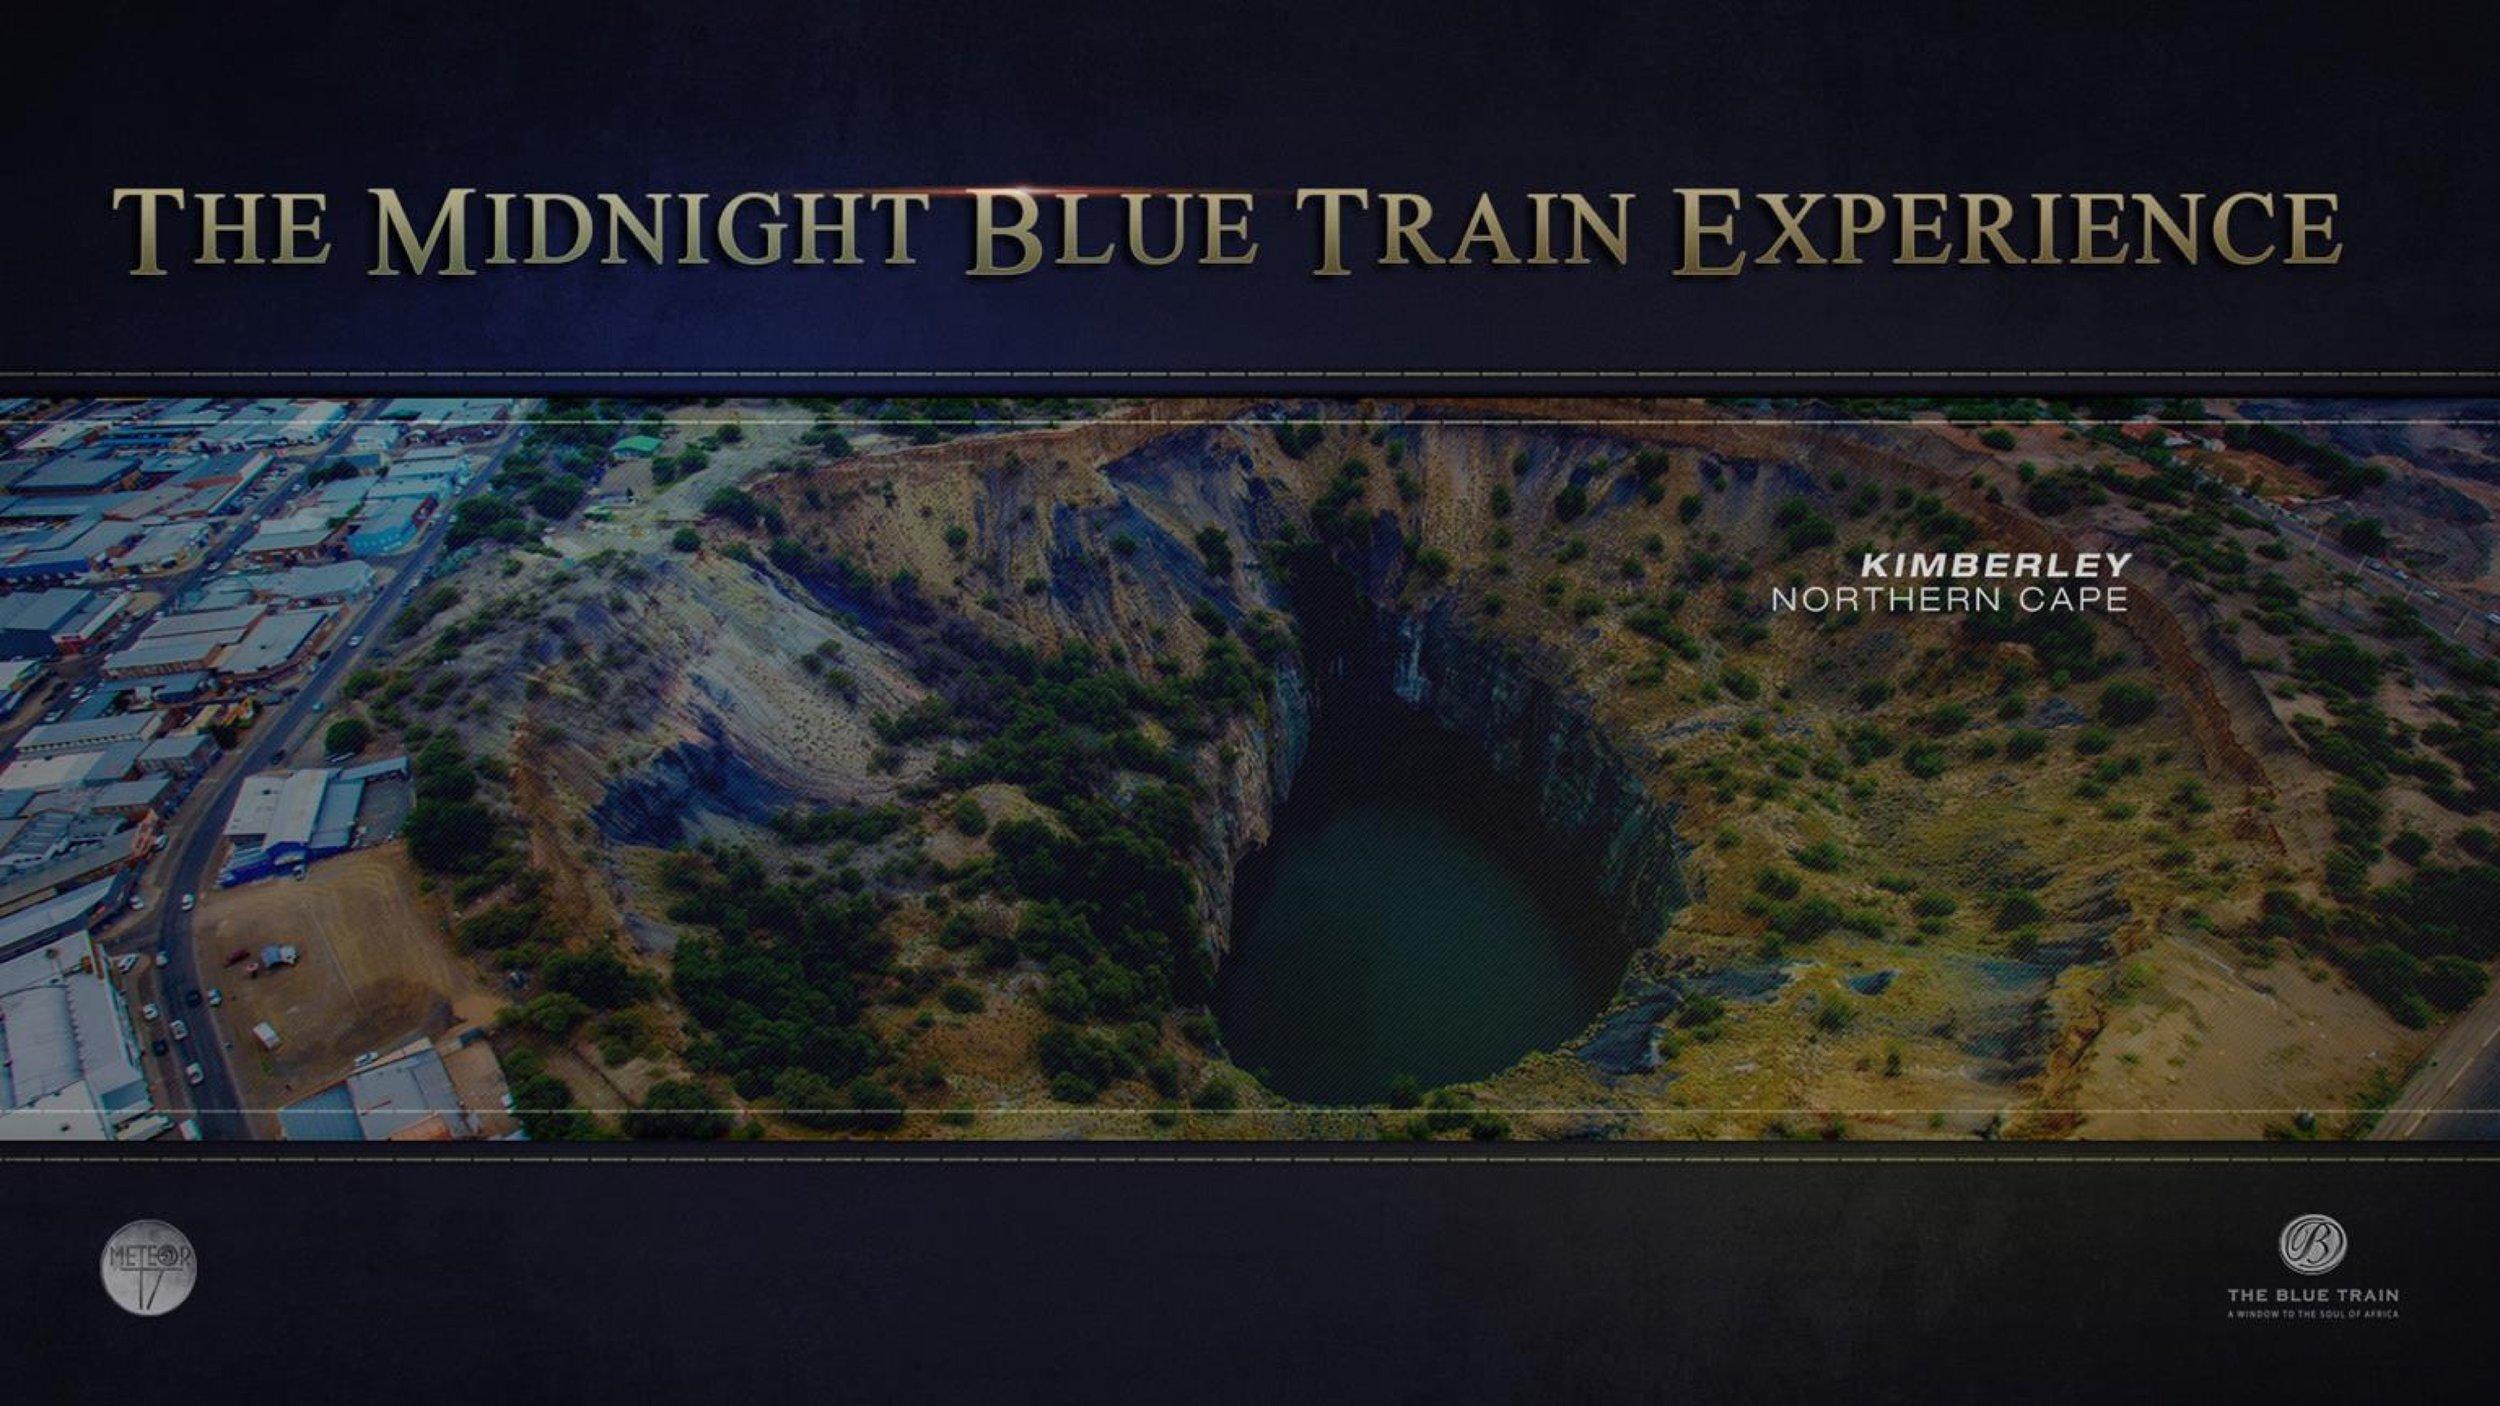 Midnight Blue Train *Transnet M17 updated deck 3 29.jpeg